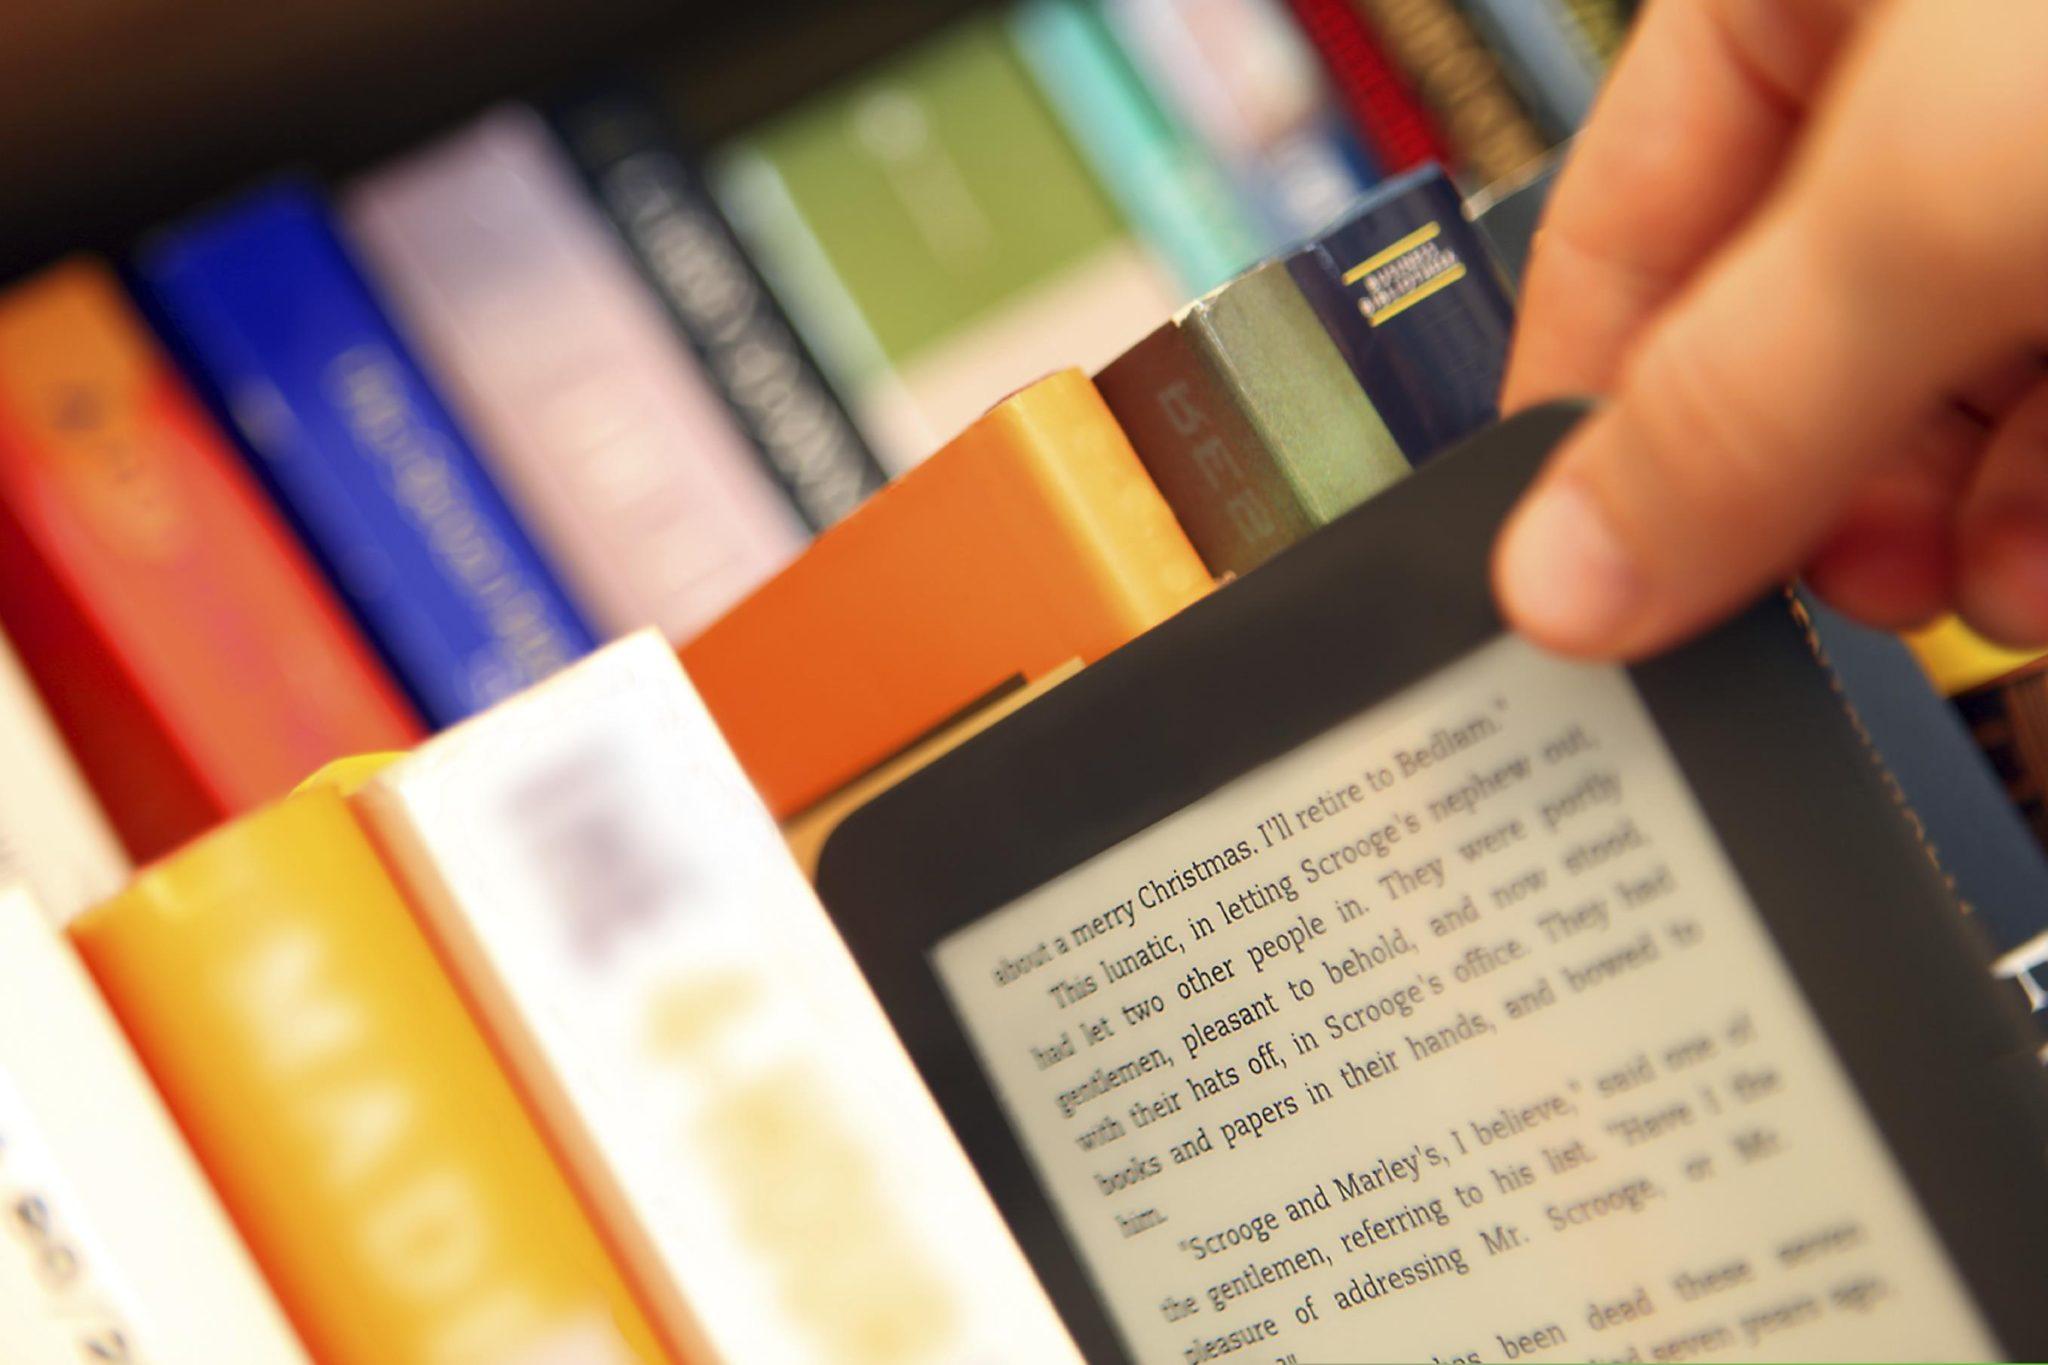 free trading eBooks | Econ Alerts